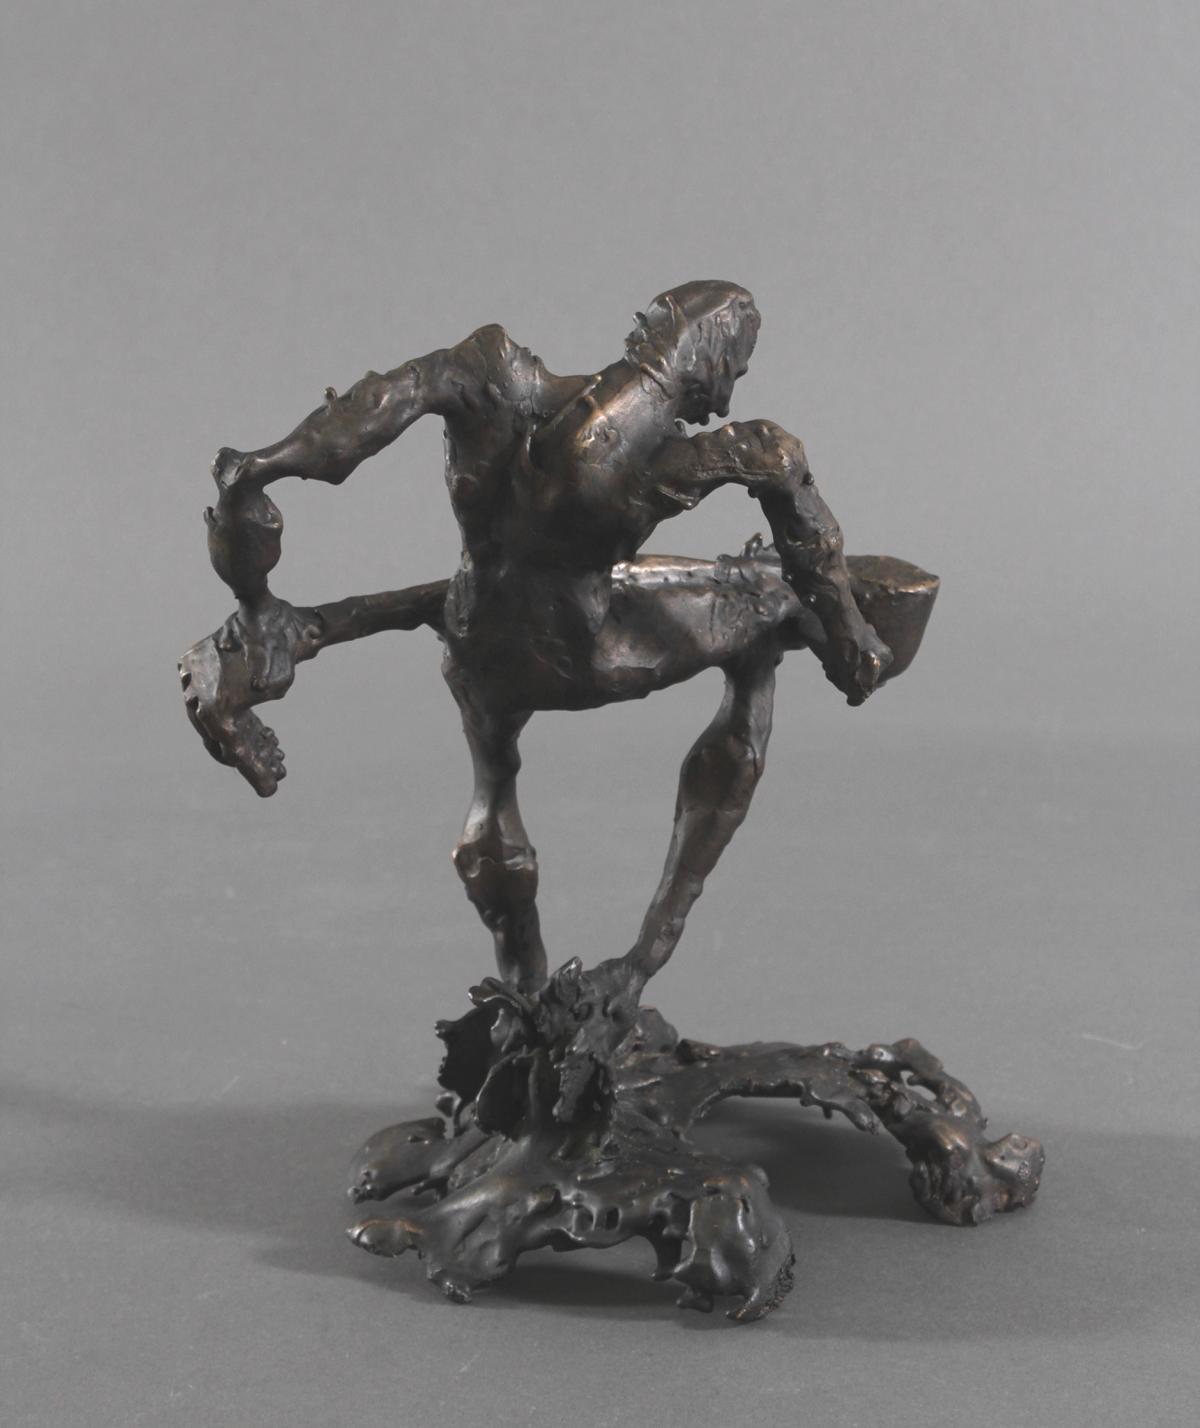 Abstrakte Bronzeskulptur 'Giesser', 2. Hälfte 20. Jh.-3